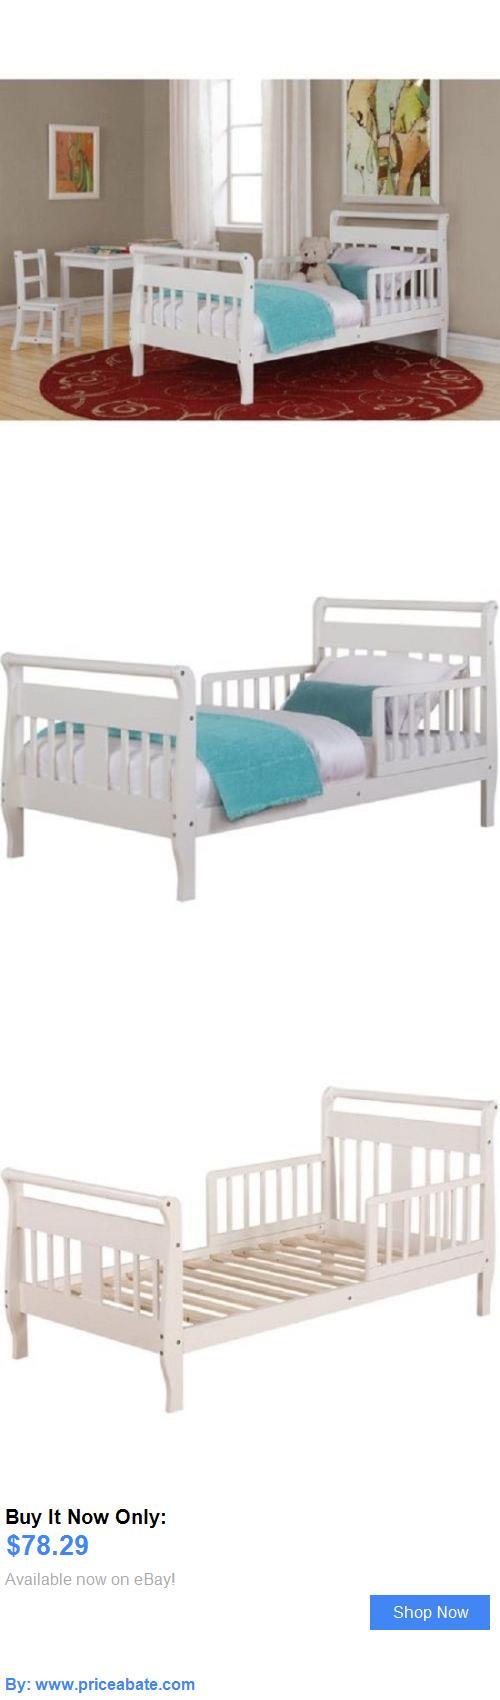 Kids Furniture: Toddler Bed Infant Baby Sleigh Furniture Kids Bedroom Hardwood White New BUY IT NOW ONLY: $78.29 #priceabateKidsFurniture OR #priceabate